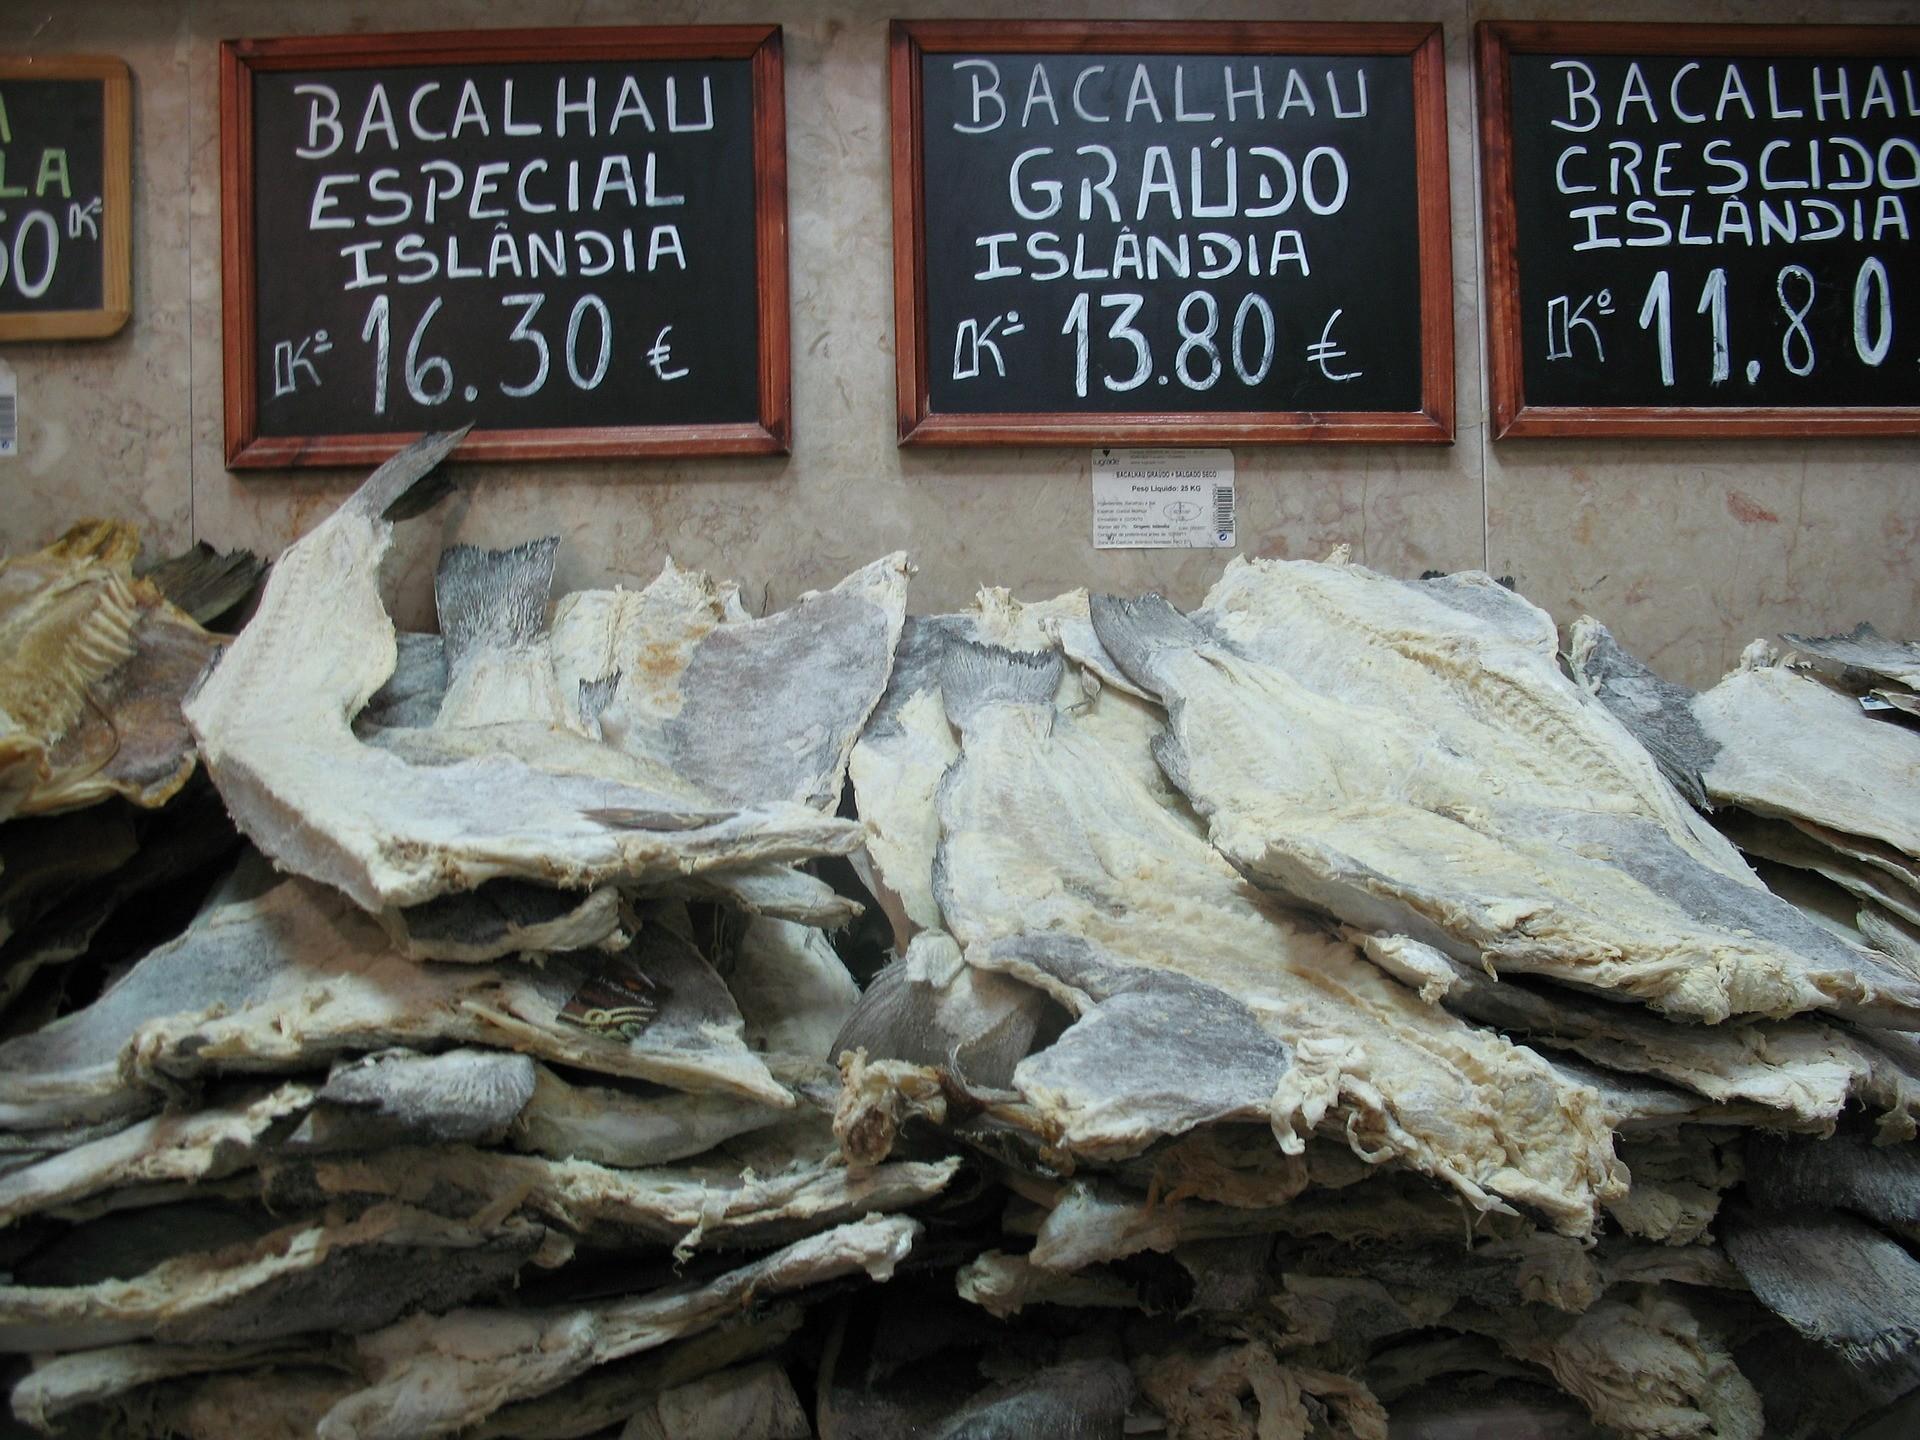 Bacalhau mania